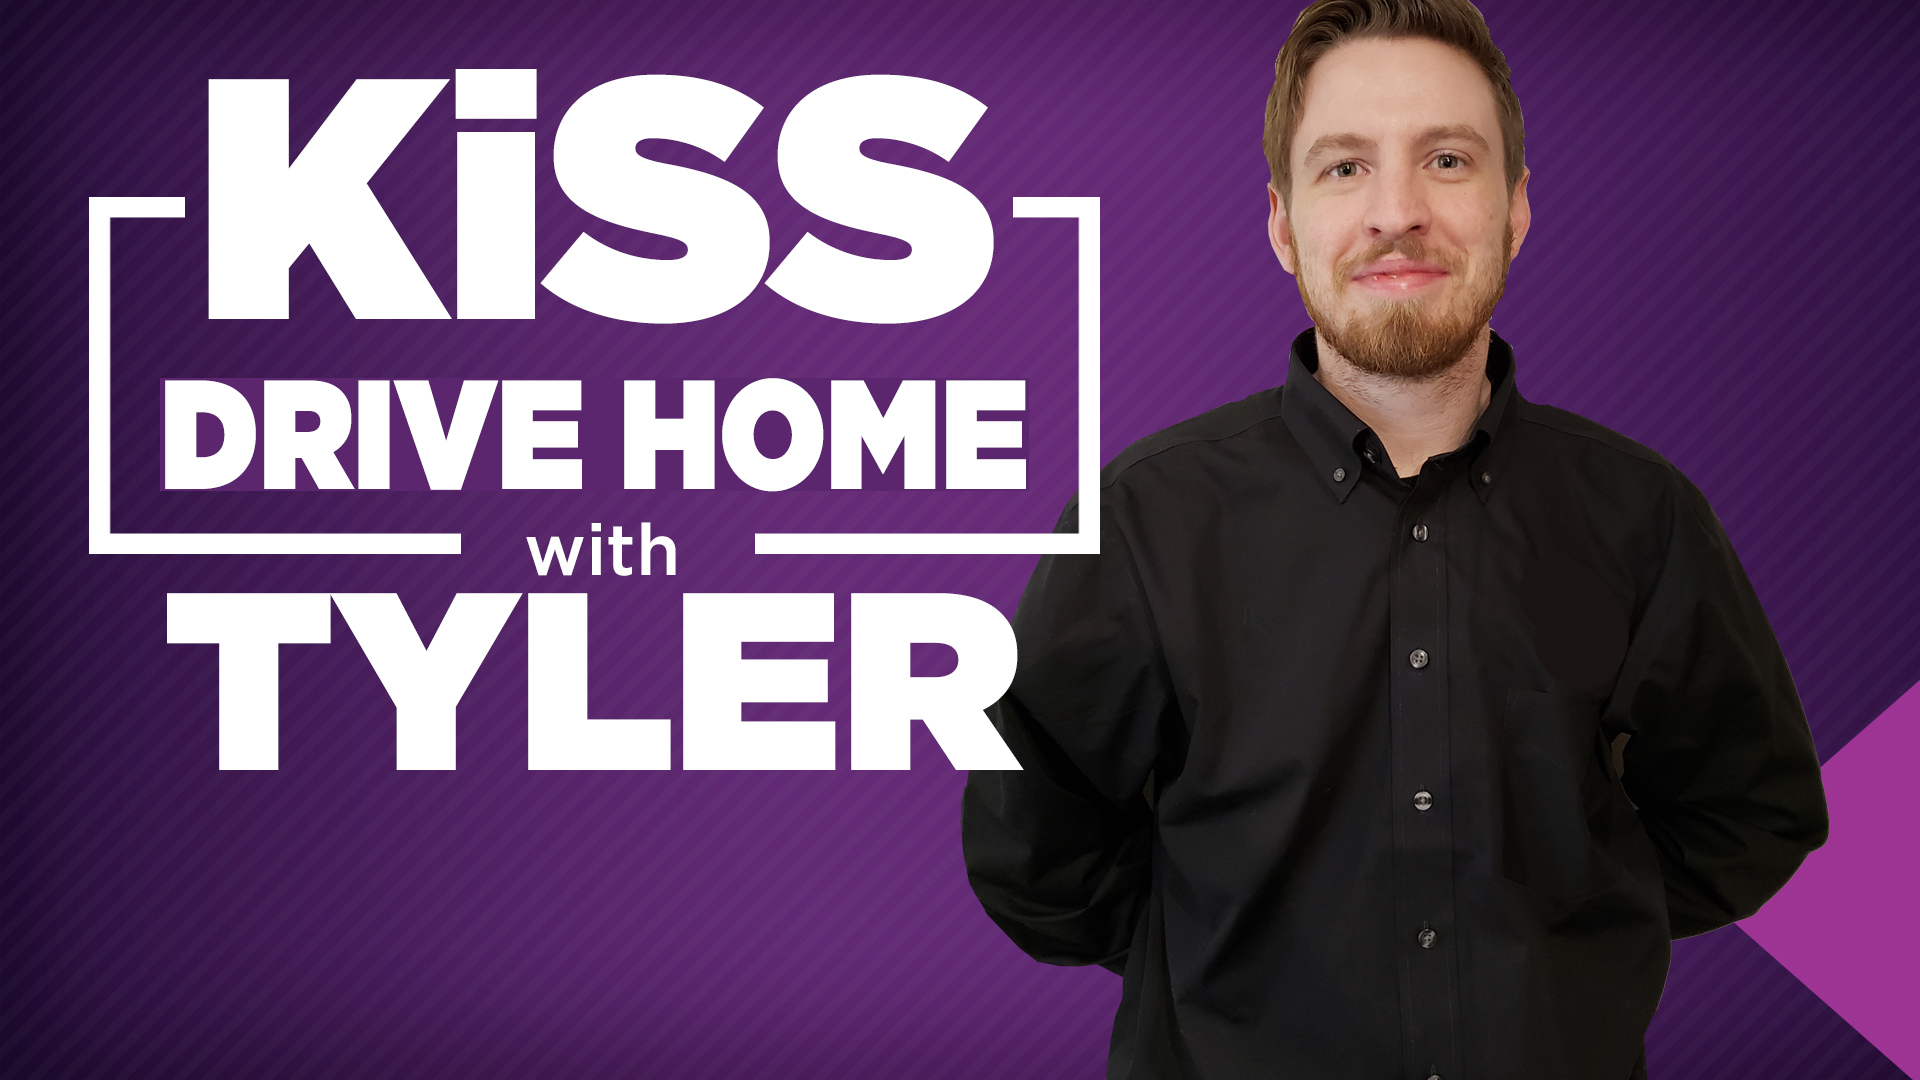 Kiss tyler drivehome